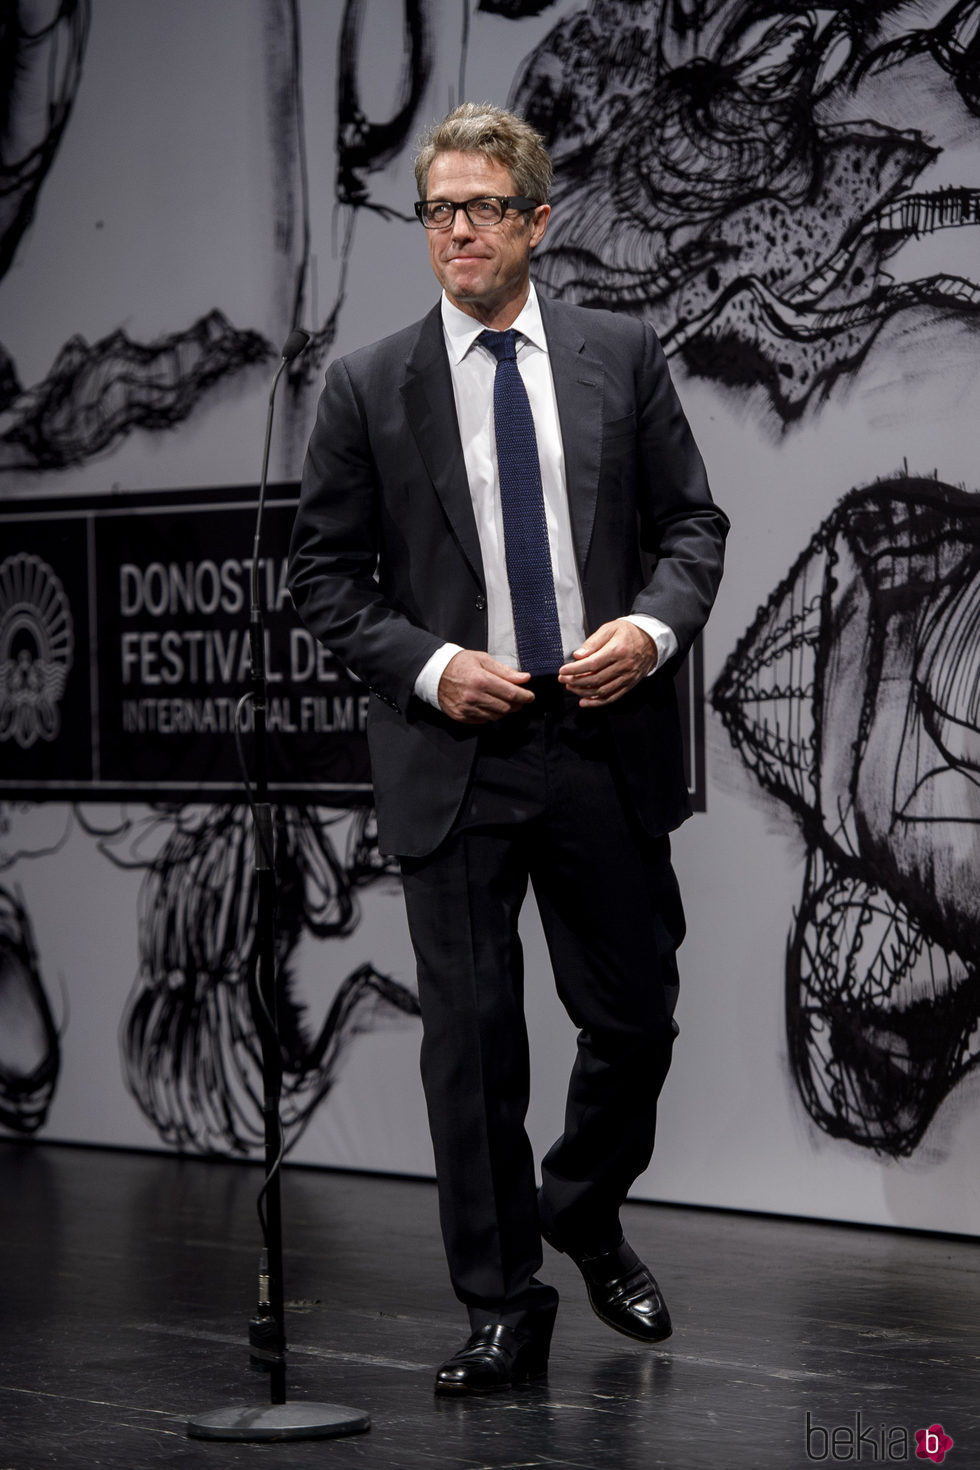 Hugh Grant en la premiere 'Florence Foster Jenkins' en el Festival de Cine de San Sebastián 2016